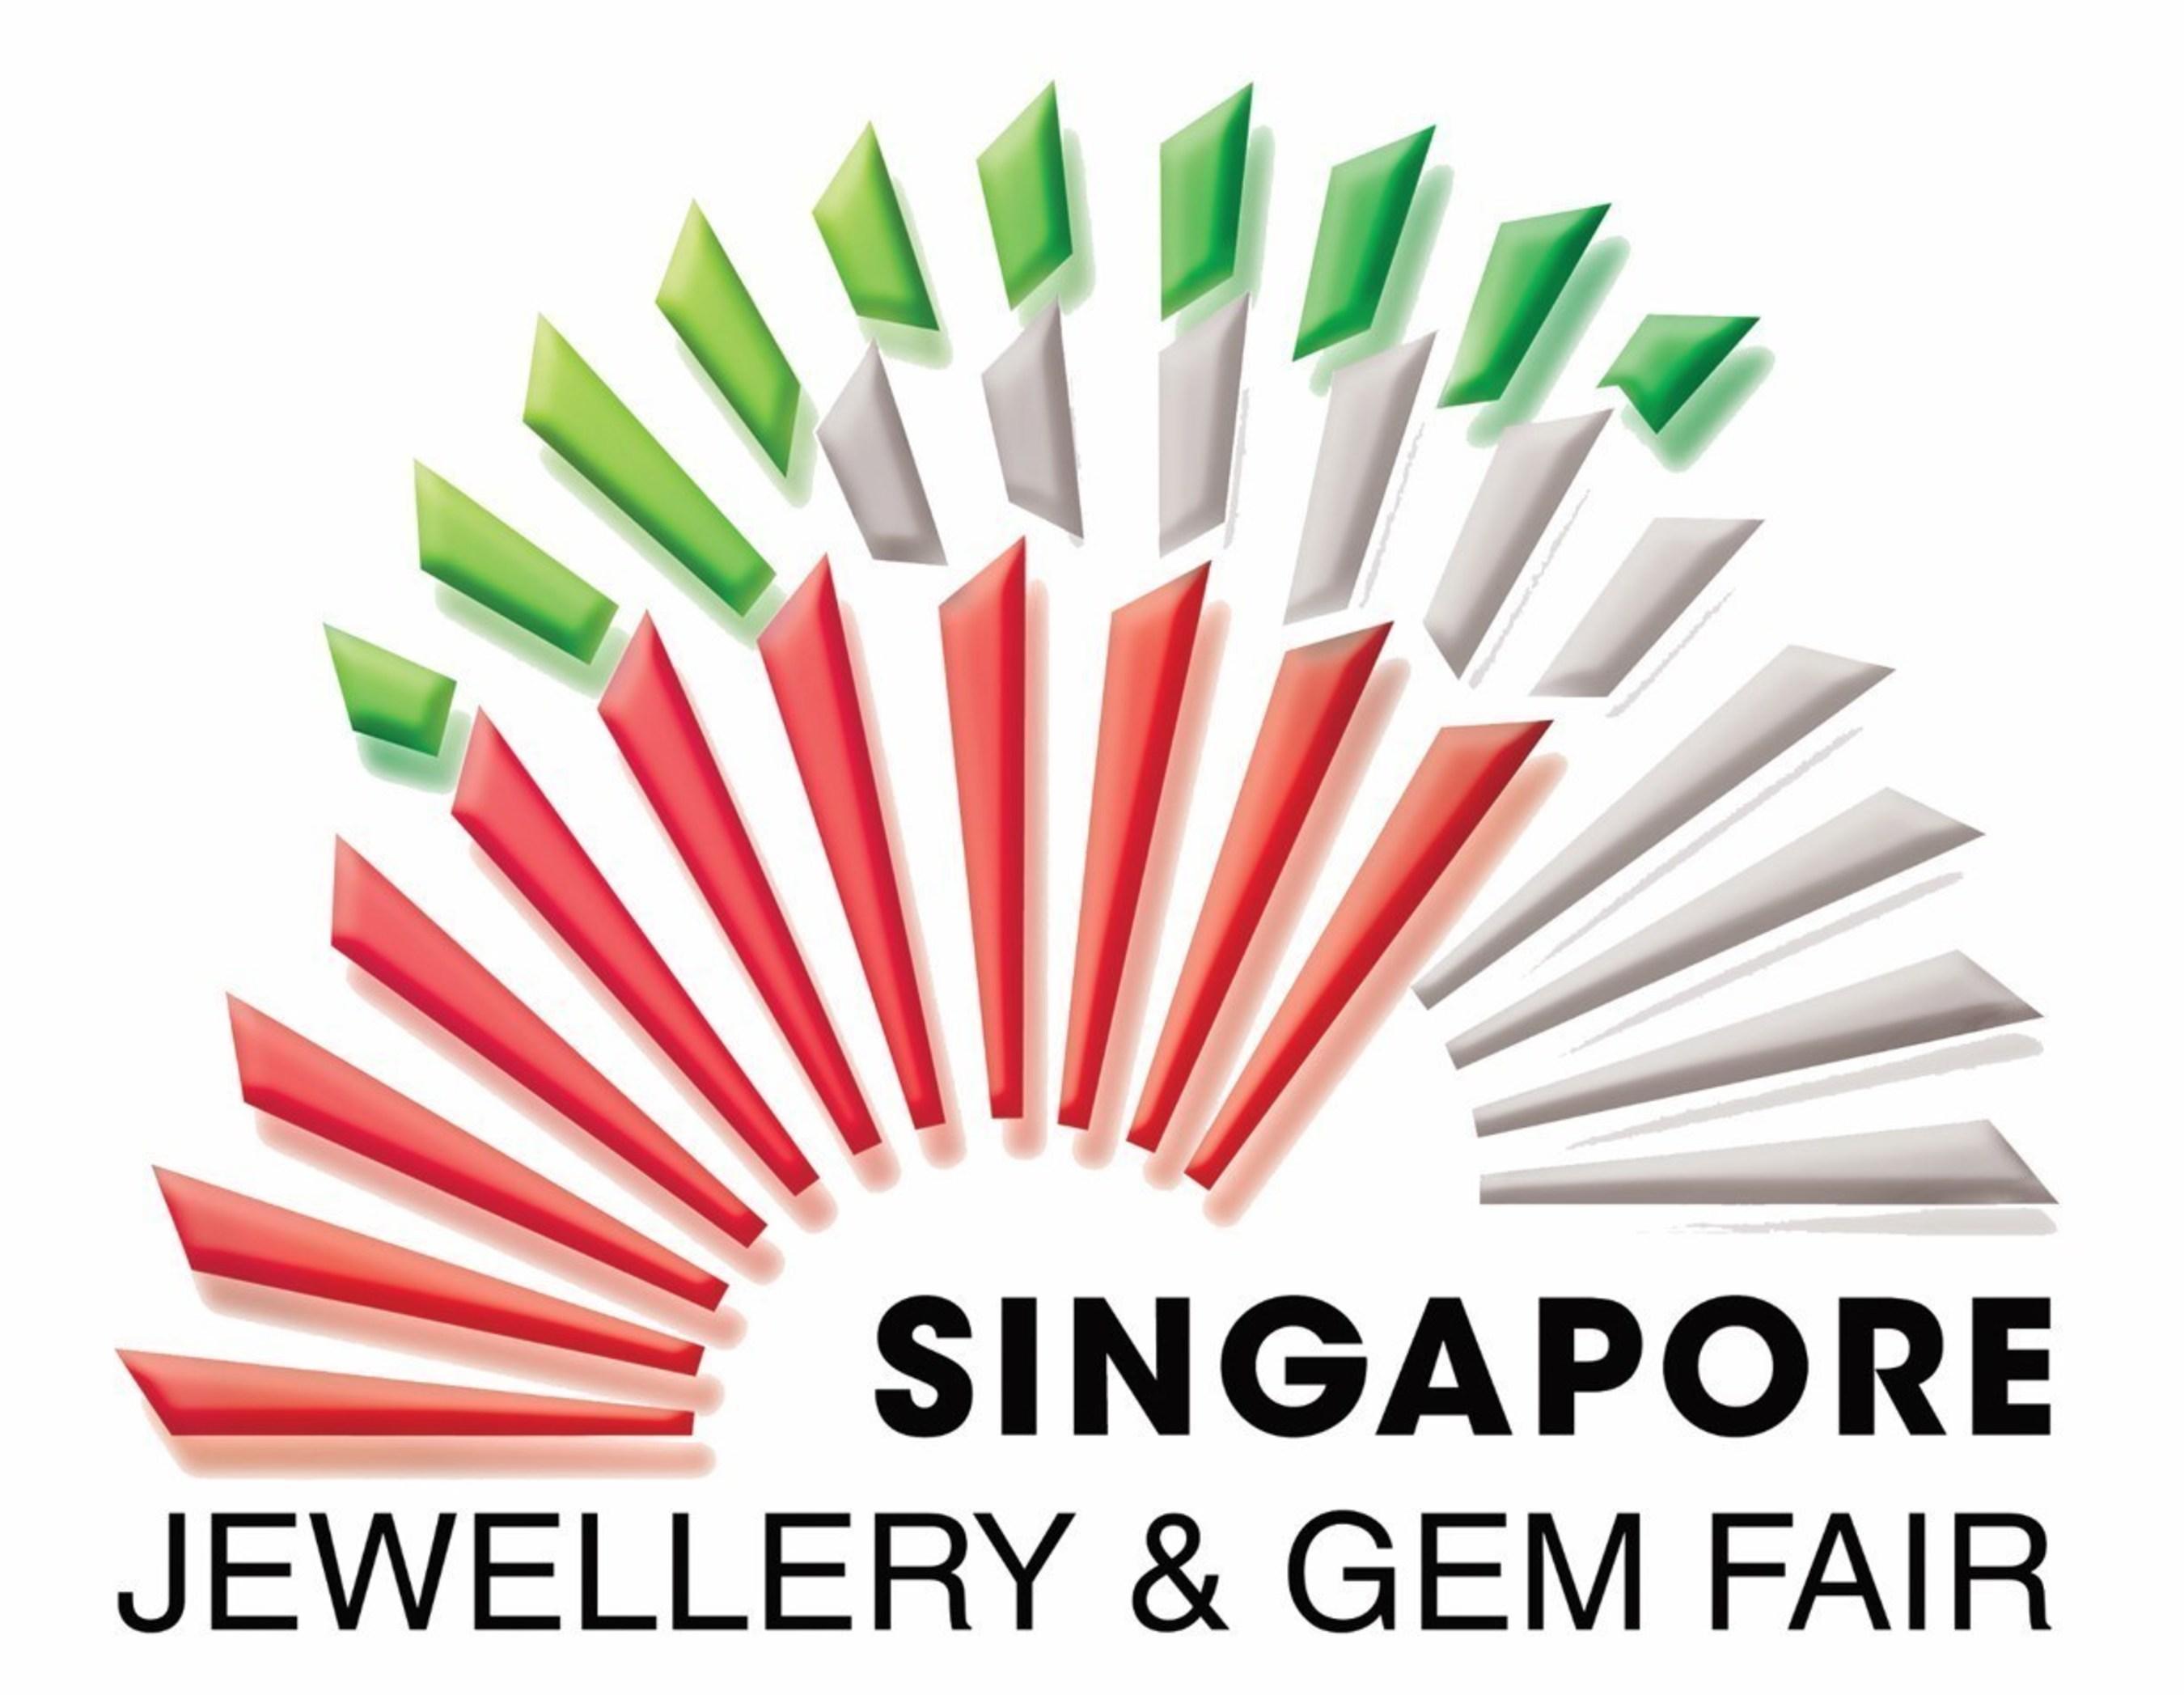 Singapore Jewellery & Gem Fair 2016 Logo